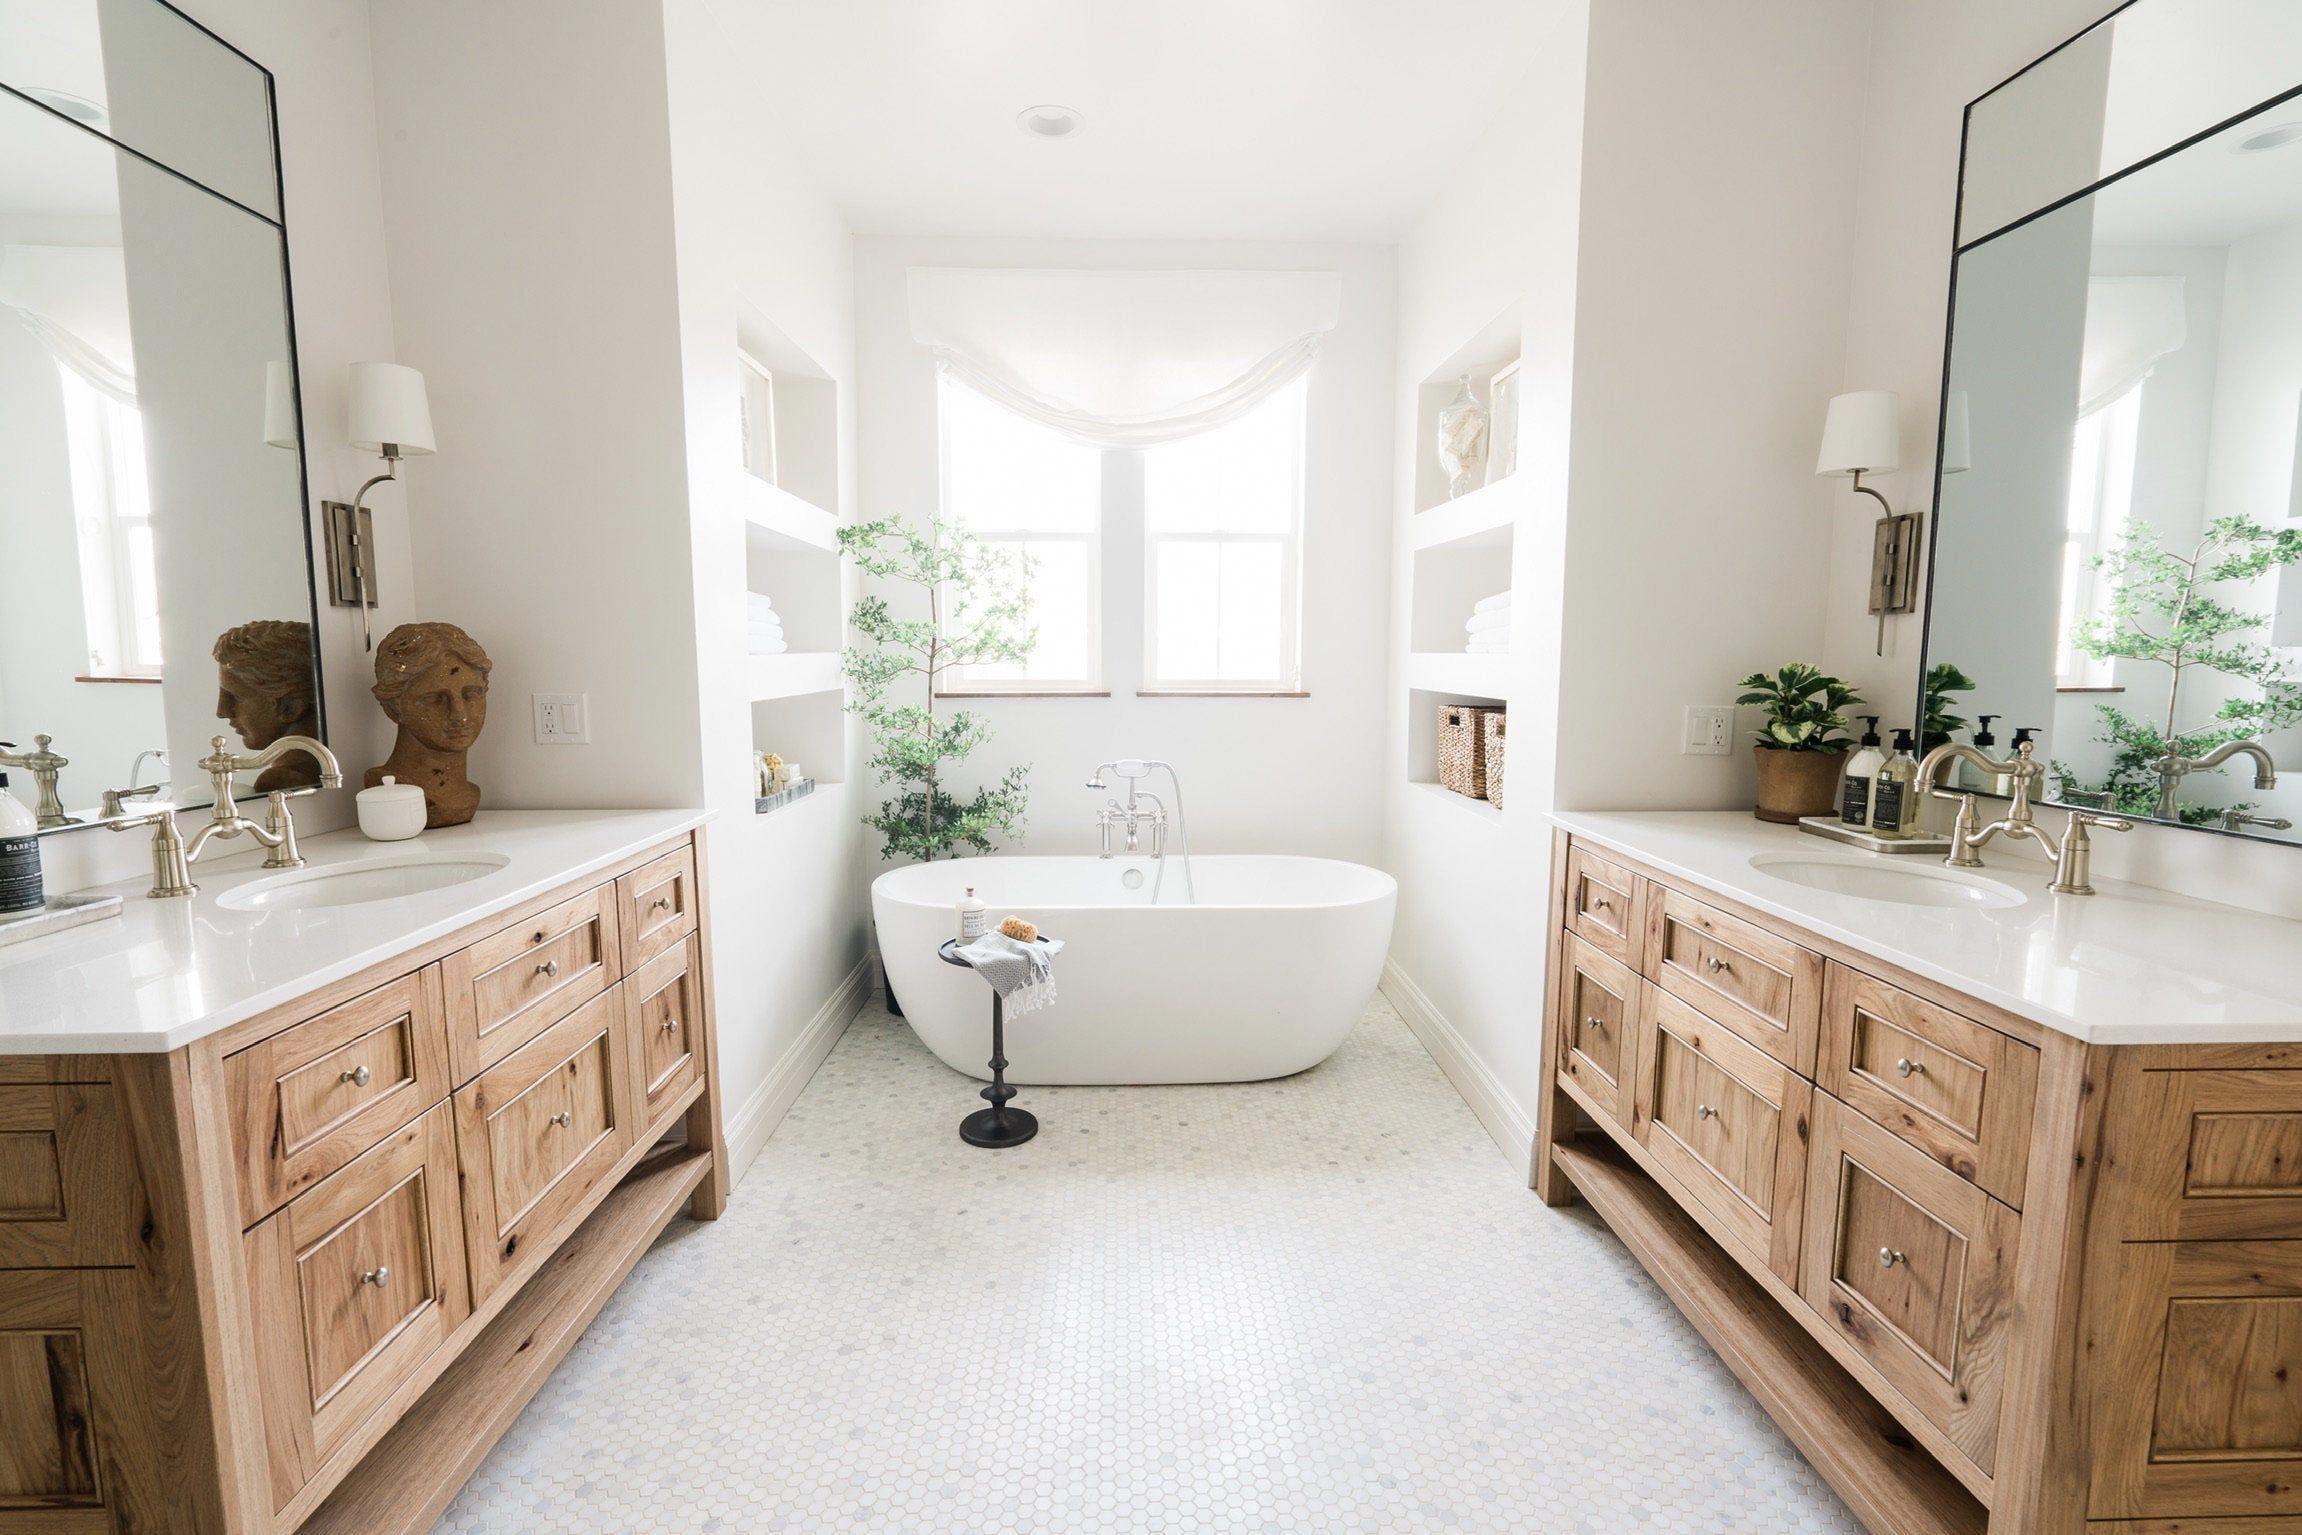 Photo of Large Modern Wall Mirror Bathroom Vanity Decorative Industrial Rectangle Steel Framed Frameless Metal Black White Steel Finish